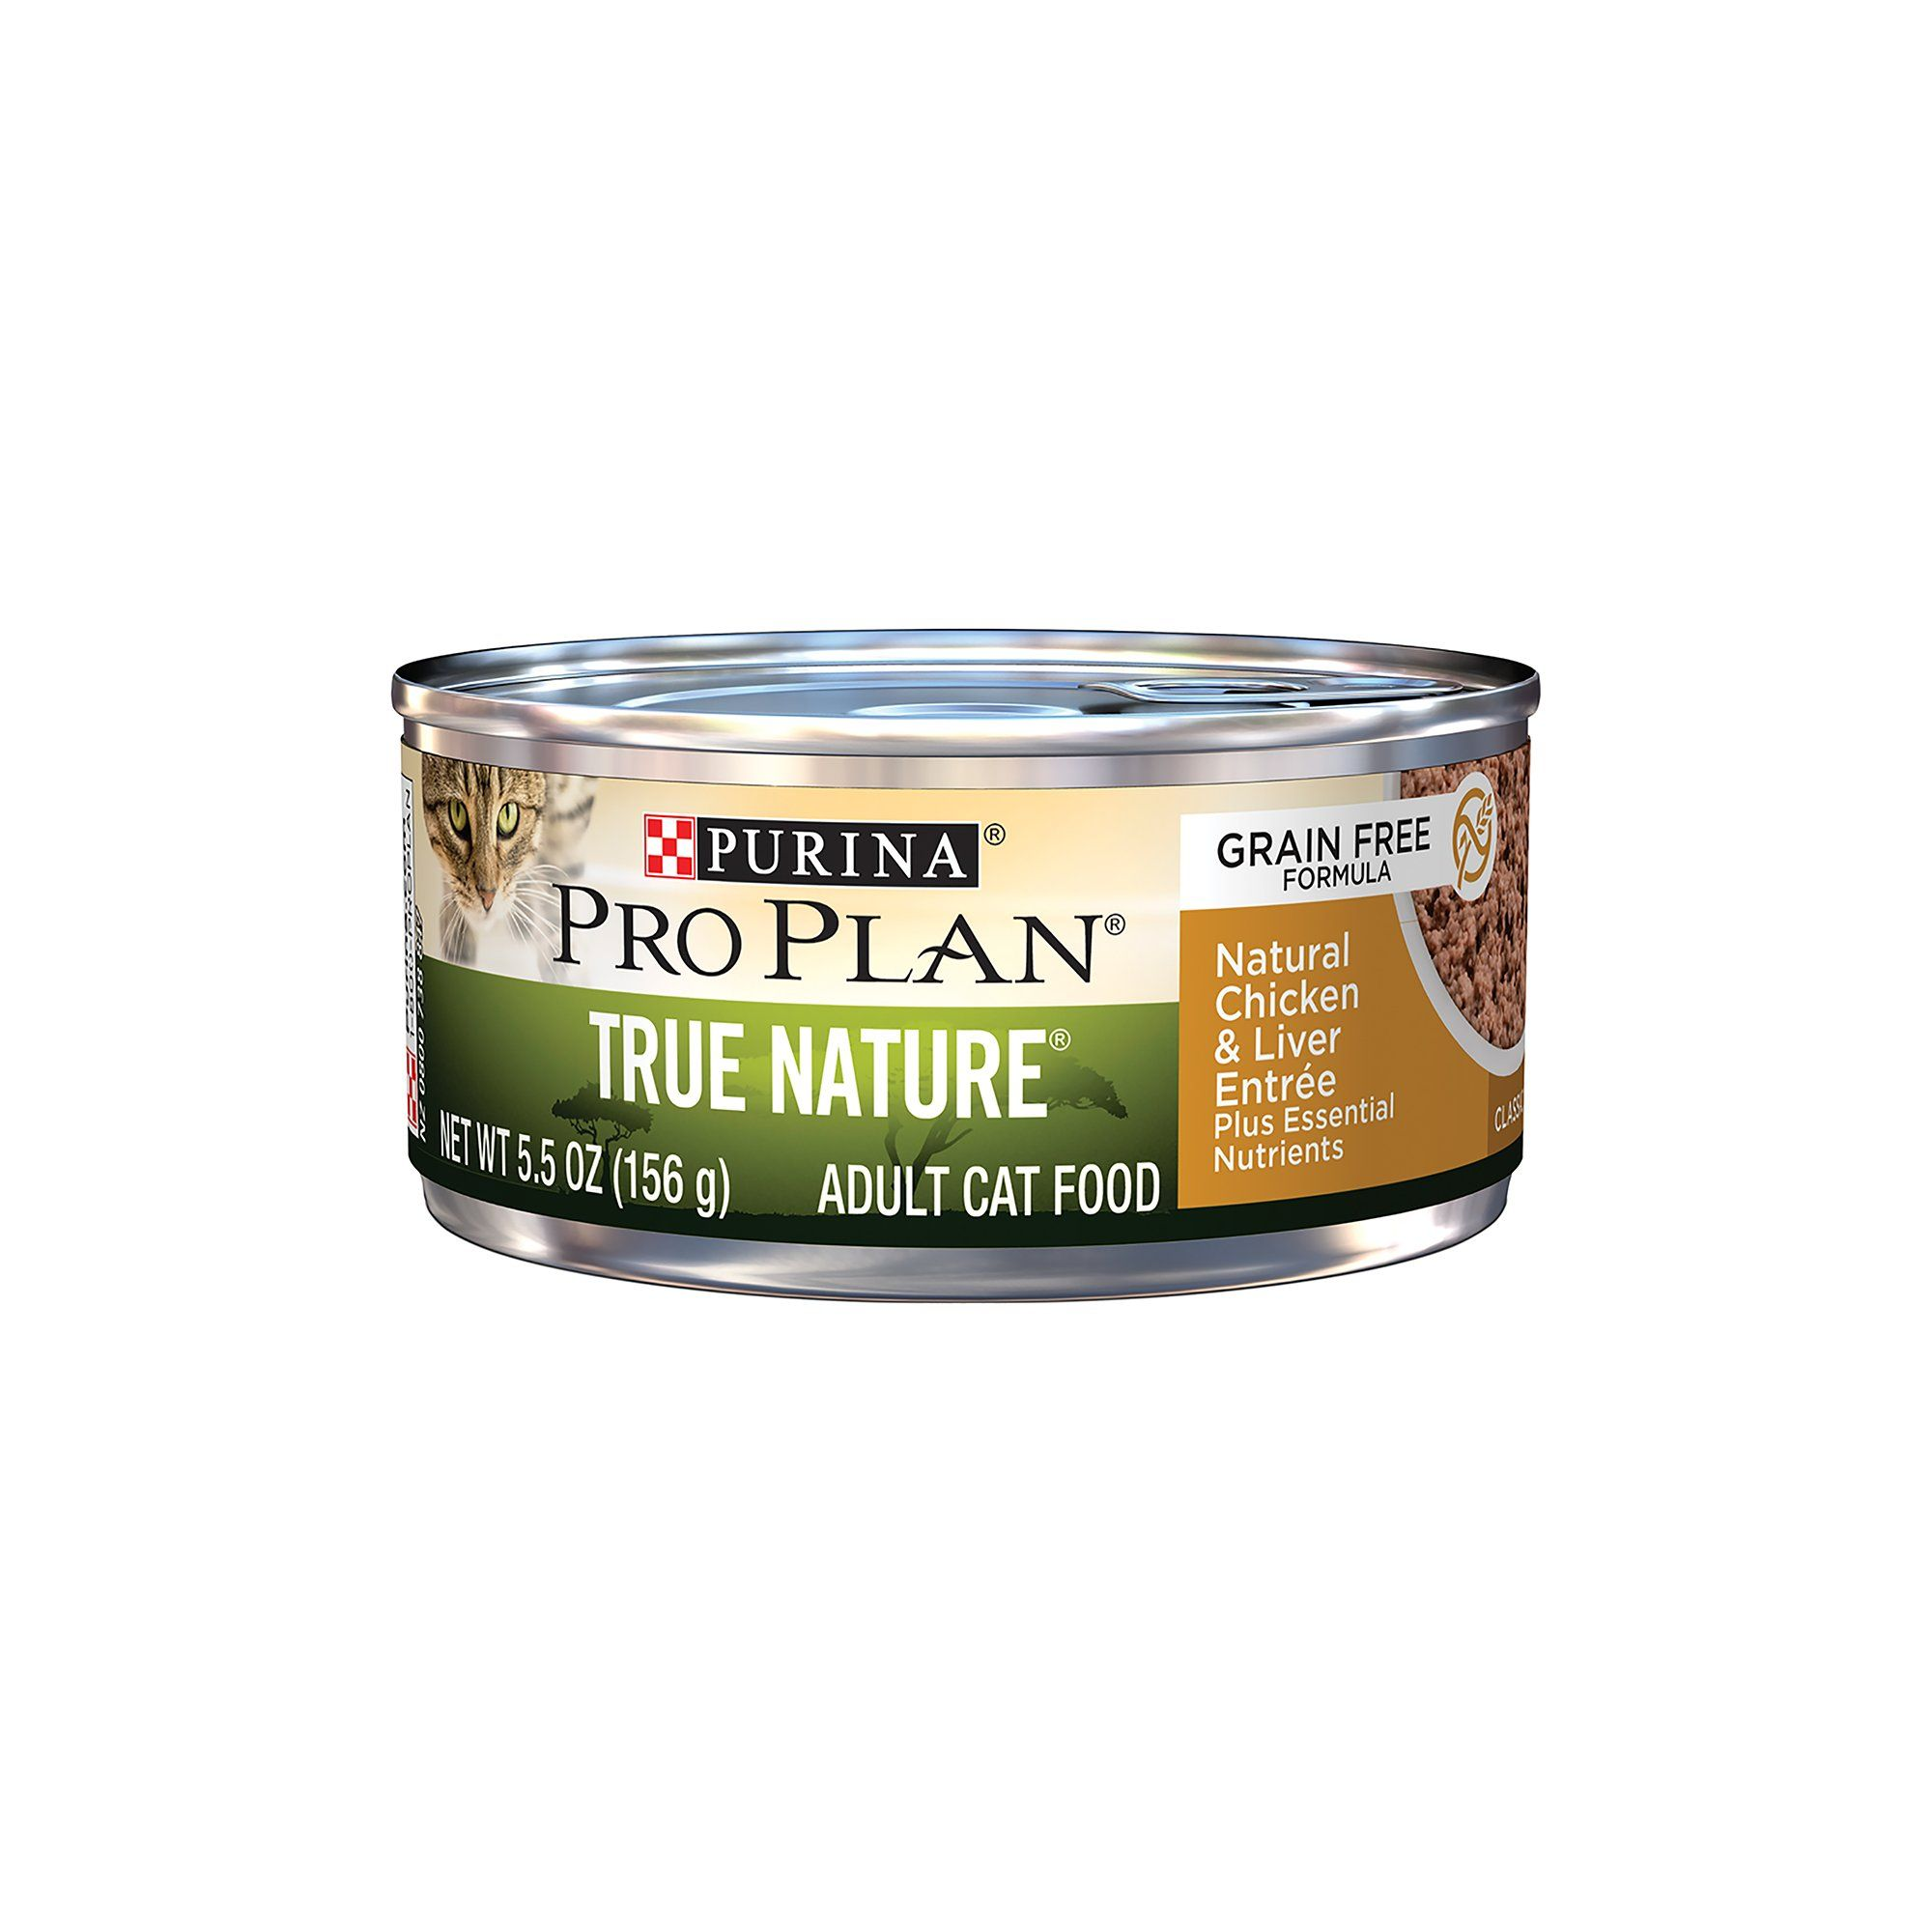 Purina Pro Plan True Nature Grain Free Formula Natural Chicken Liver Entree Wet Cat Food 5 5 Oz Case Of 24 Grain Free Canned Cat Food Cat Food